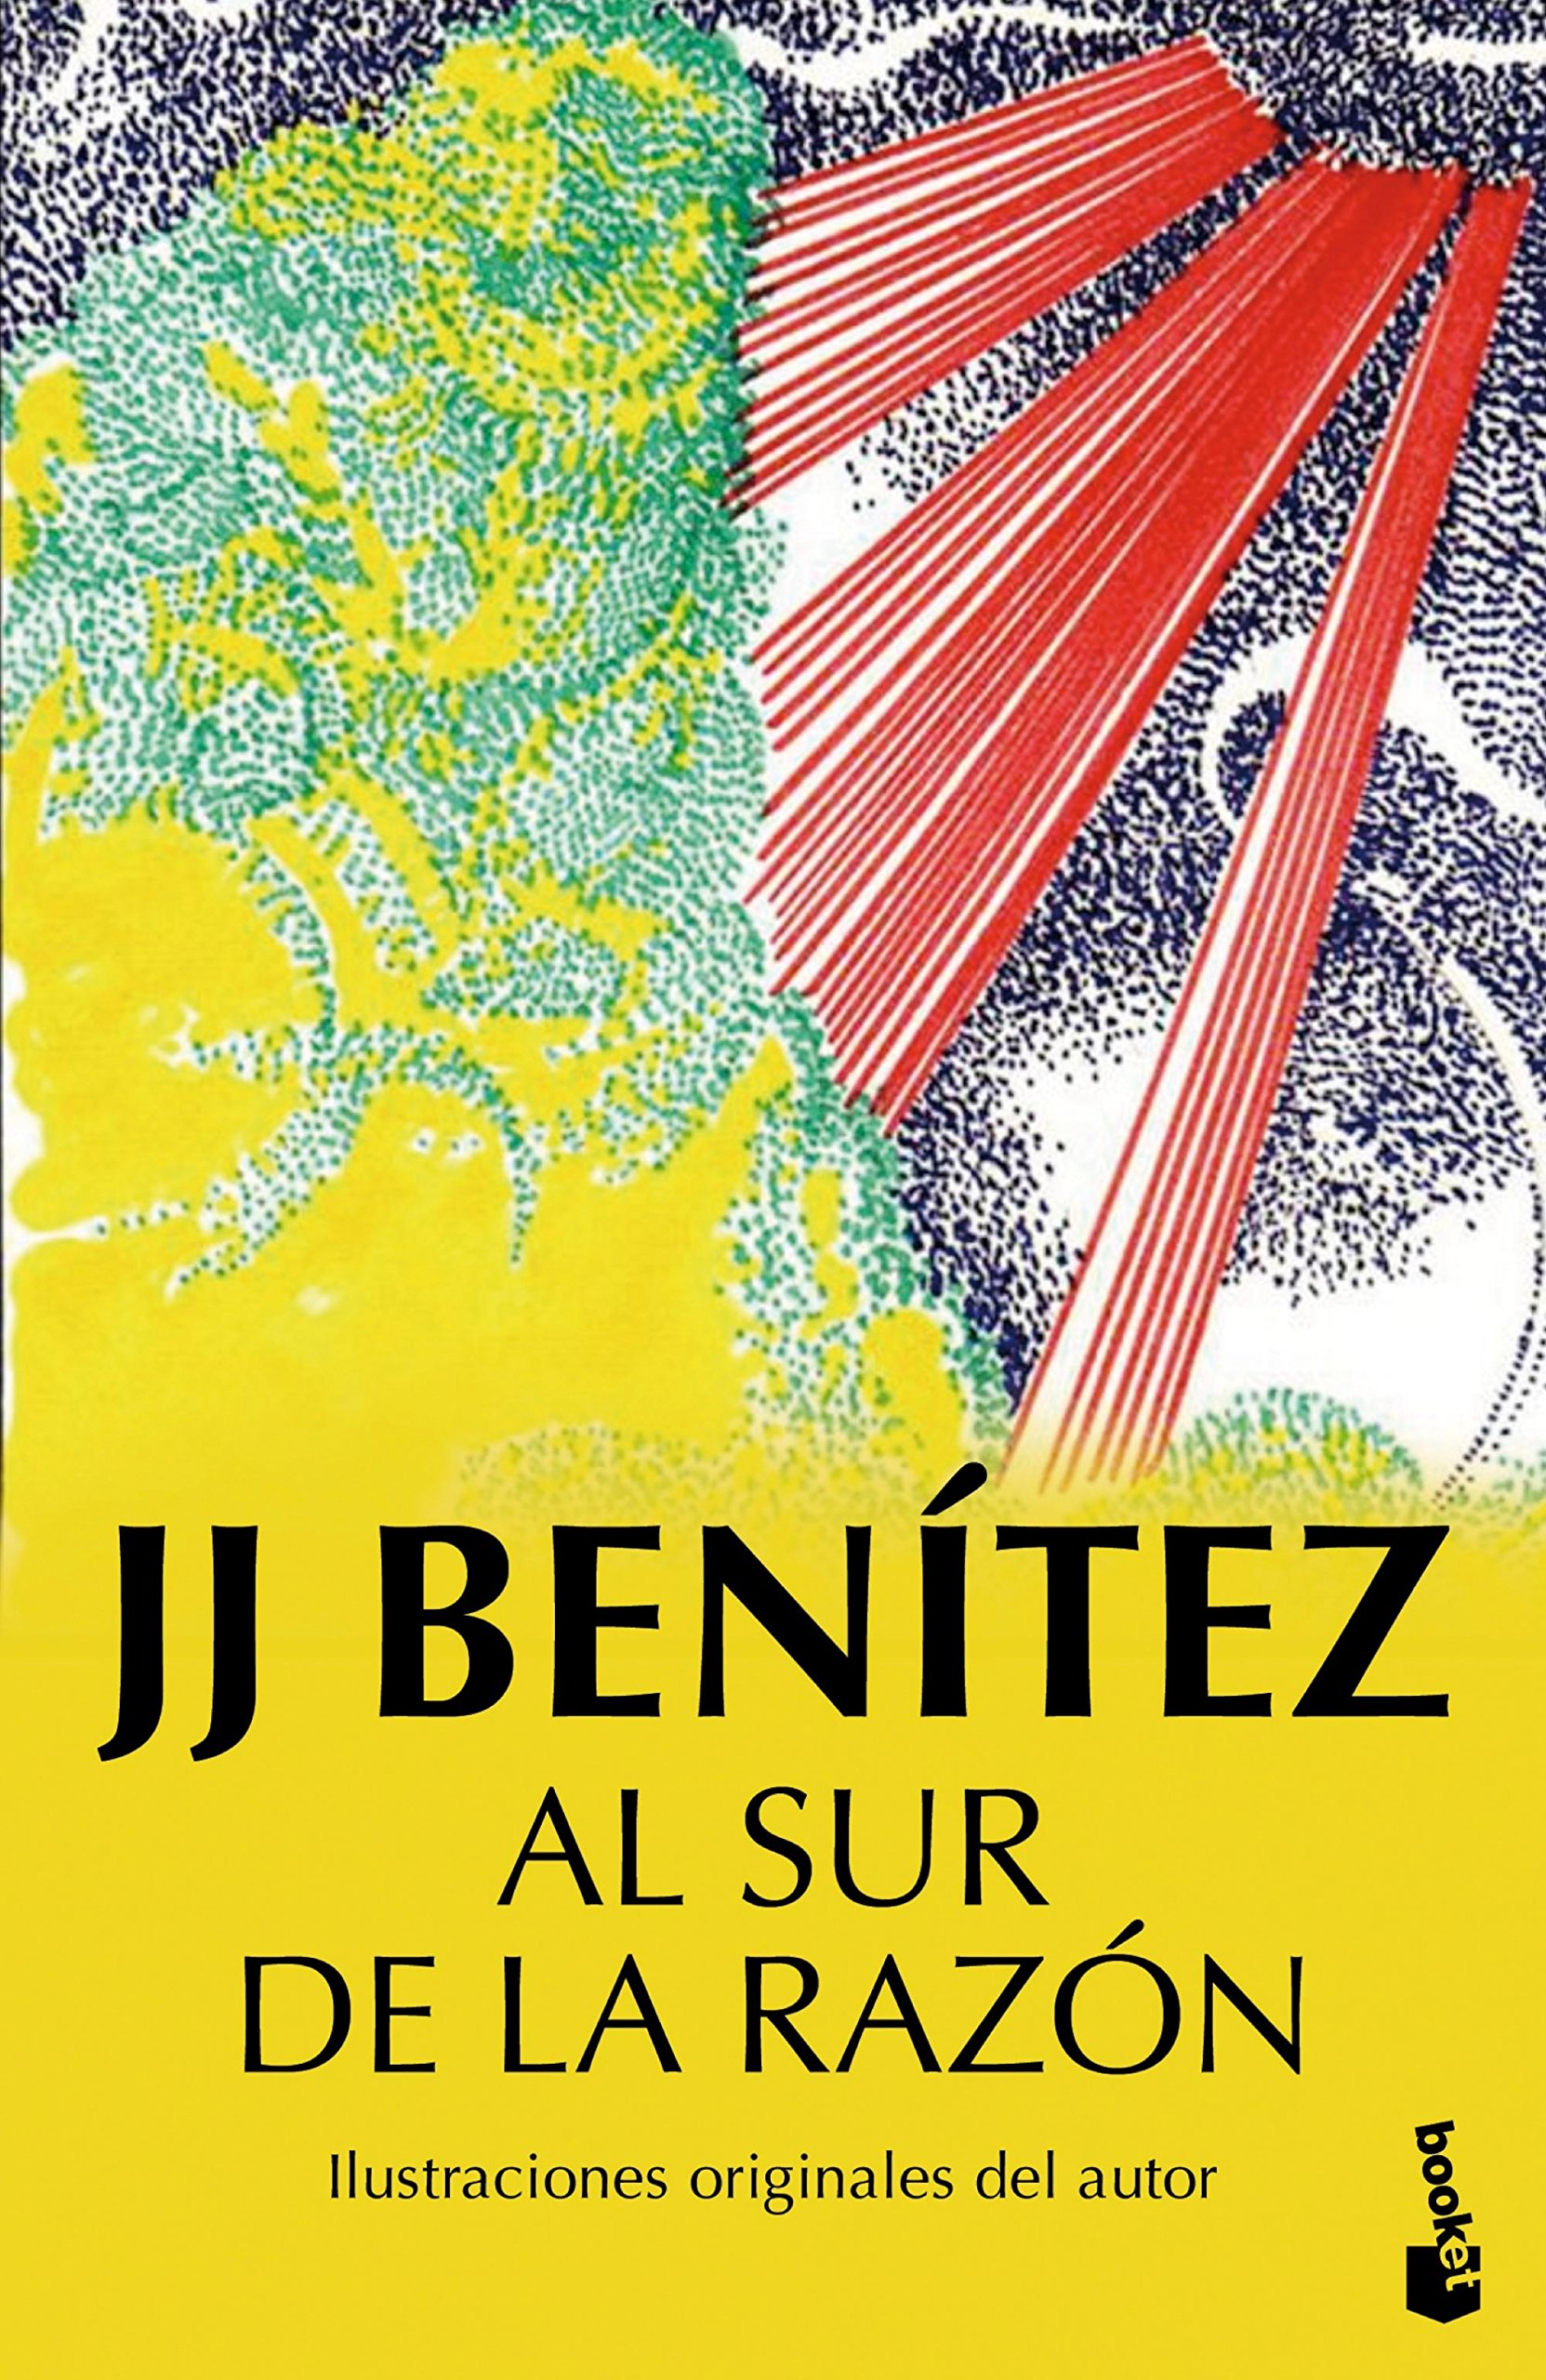 Al sur de la razón: 2 (Biblioteca J. J. Benítez): Amazon.es: J. J. ...